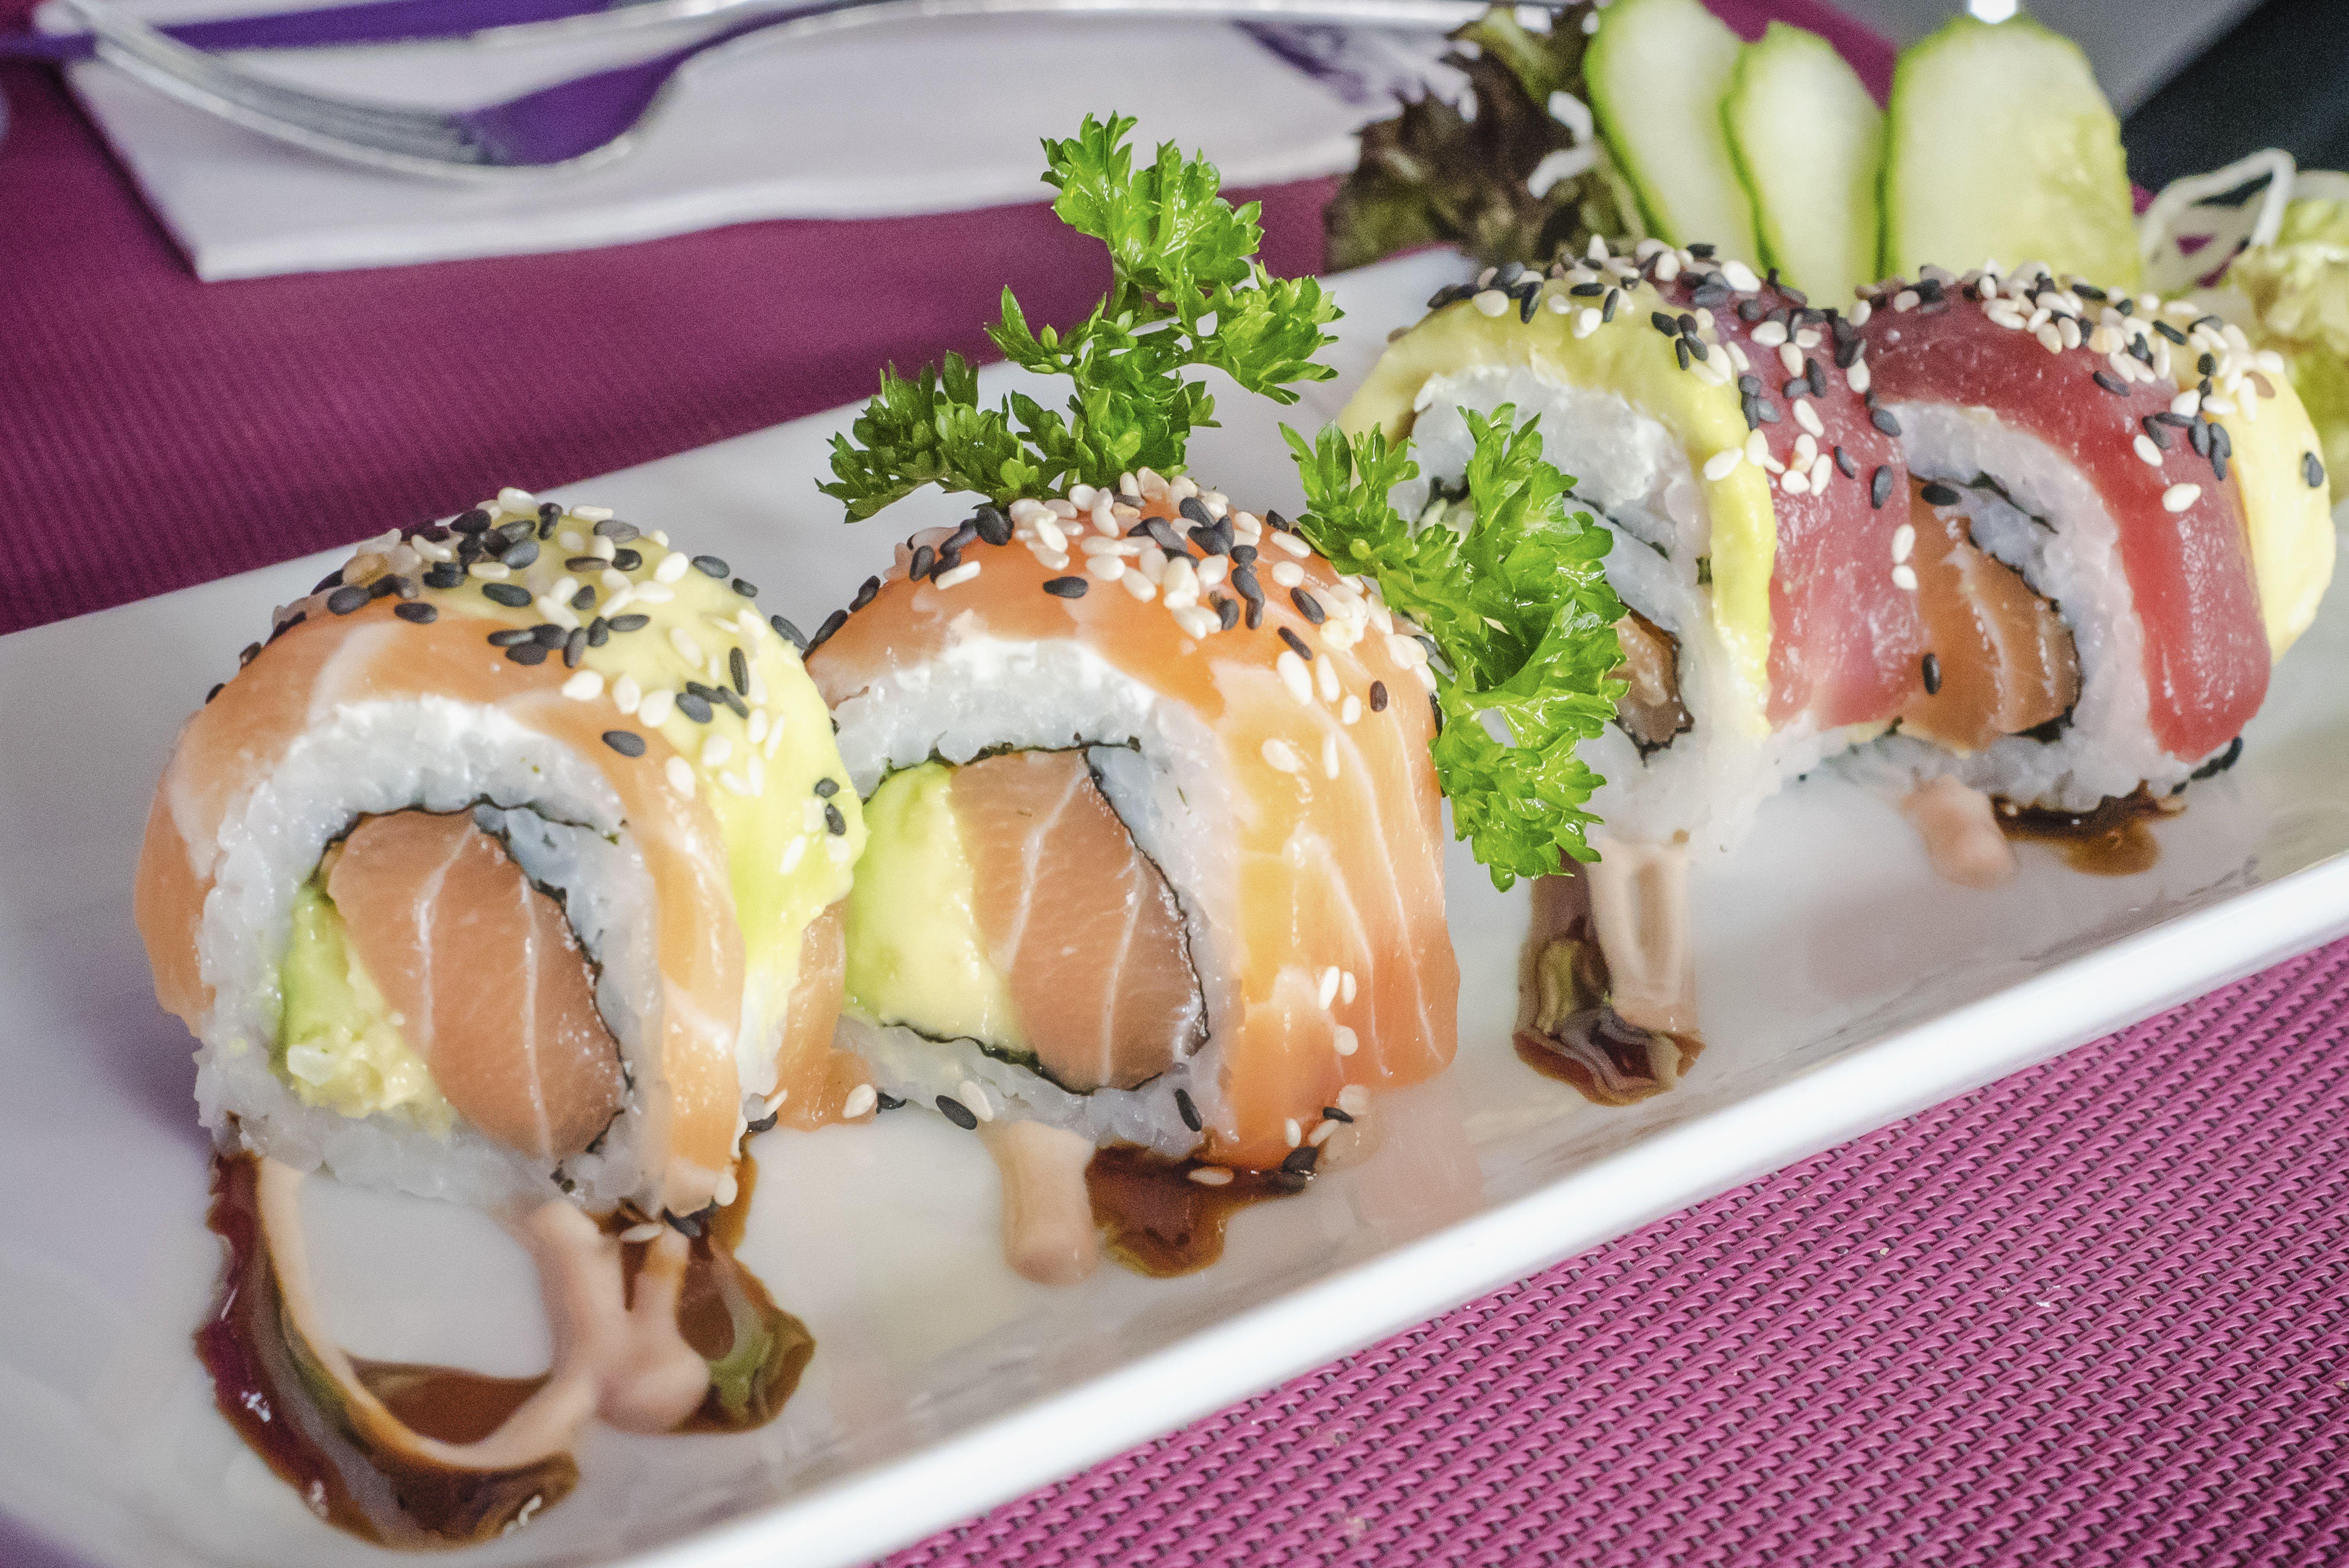 Foto 6 de Fusion food restaurant en San Bartolomé de Tirajana | Restaurante SushiMex